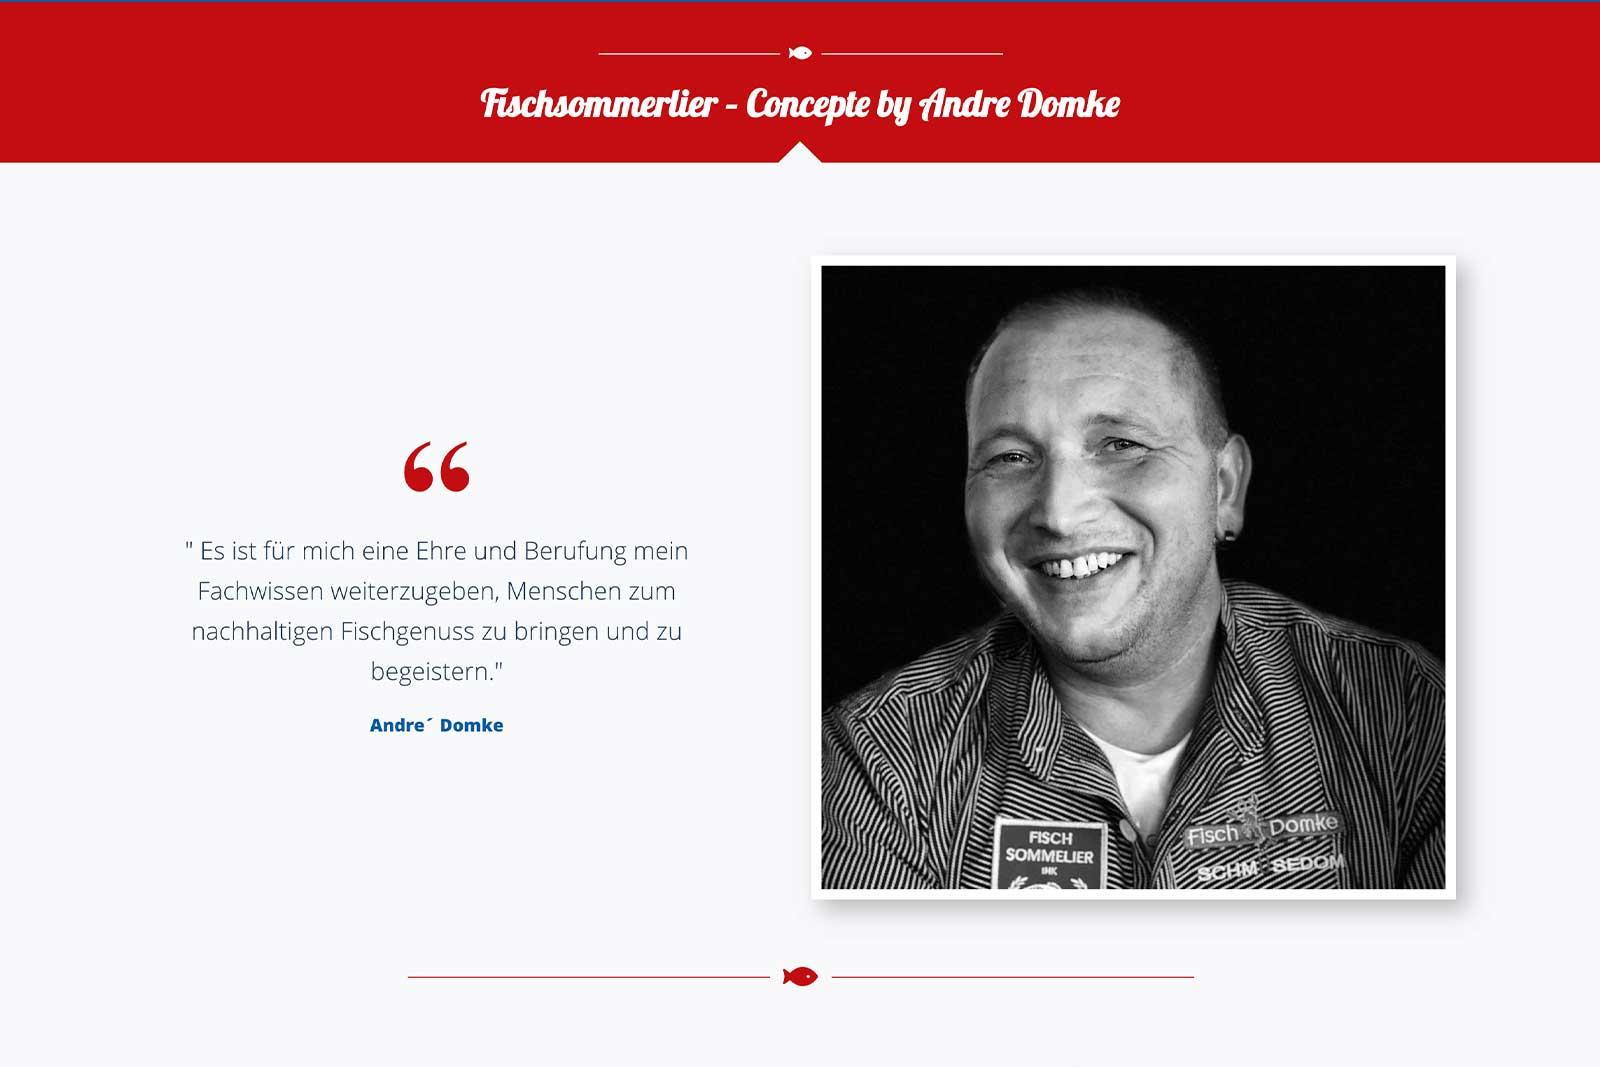 Andre Domke